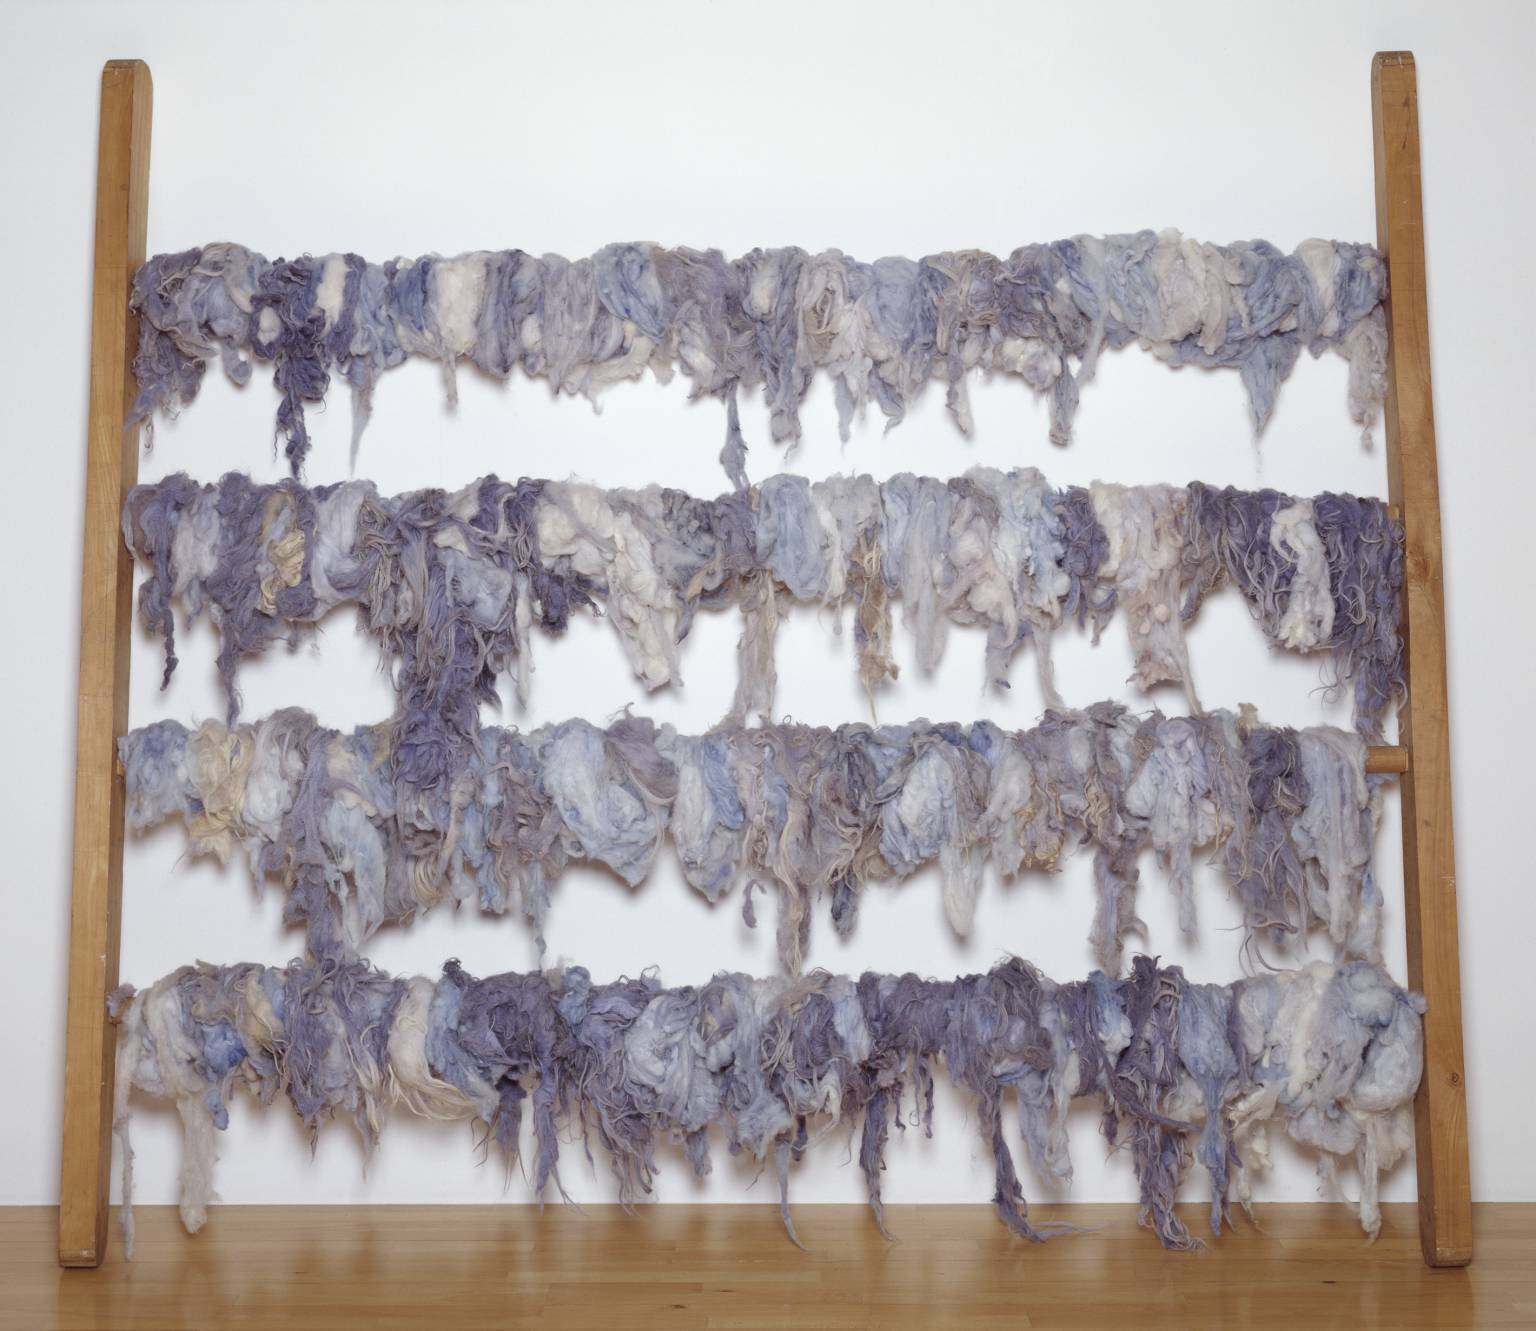 Jannis Kounellis (1968) Untitled. Wood and wool.